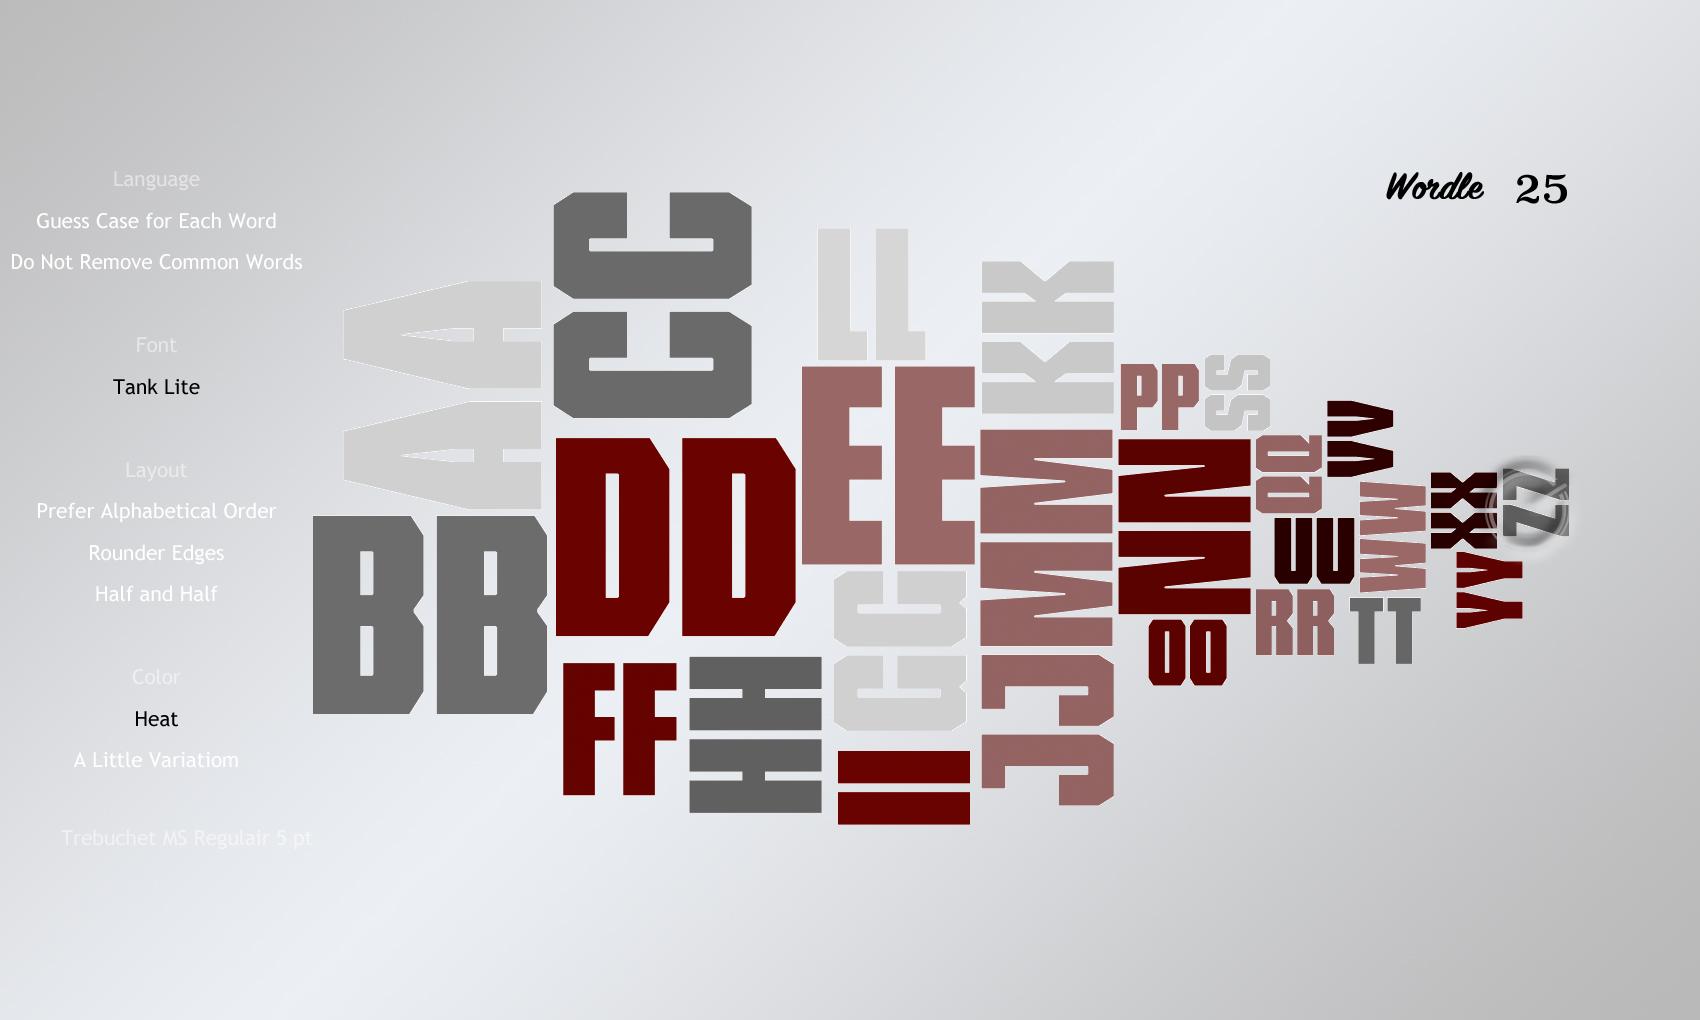 Wordle 25 Tank Lite